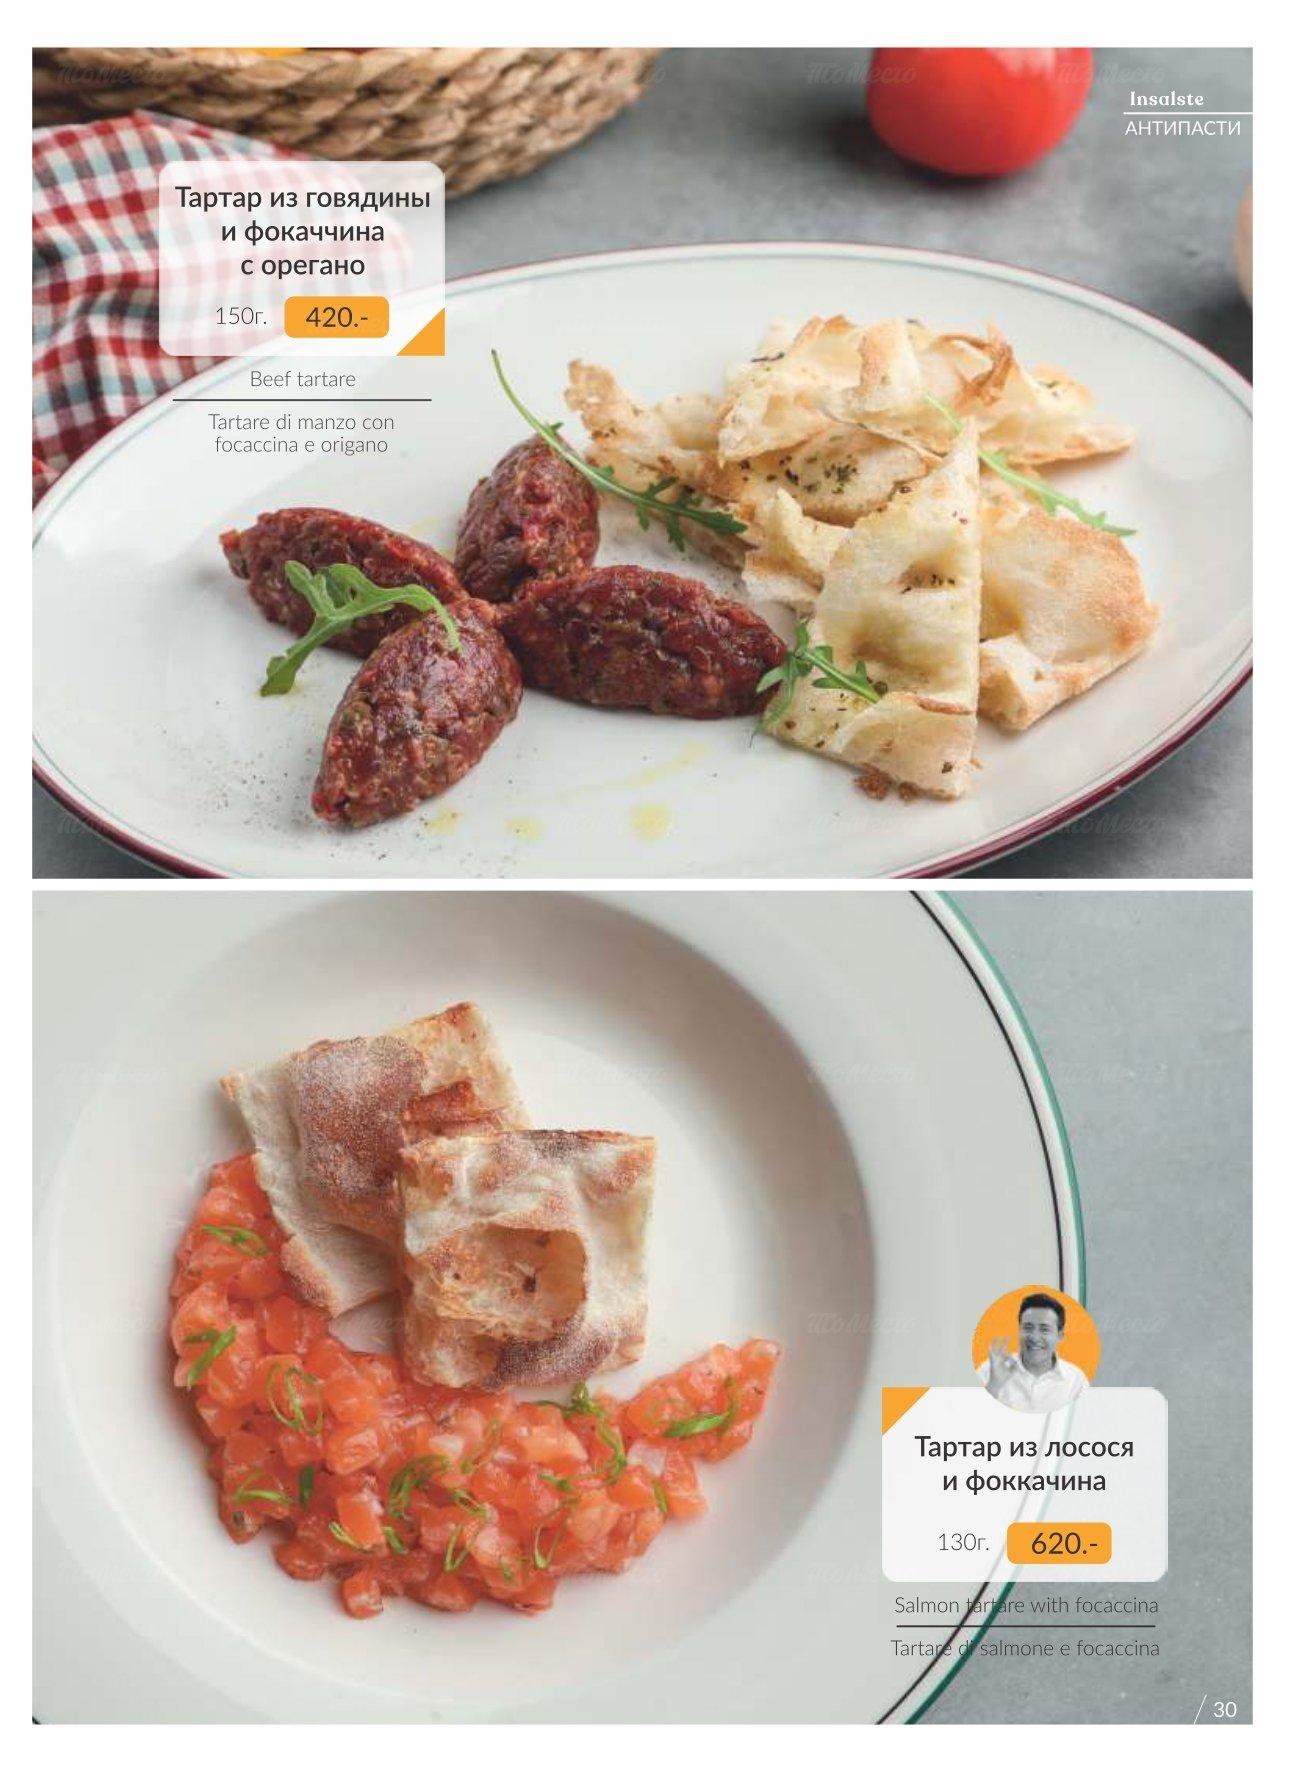 Меню ресторана Pinzeria by Bontempi (Пинцерия Бонтемпи) на Верх-Исетском бульваре фото 26